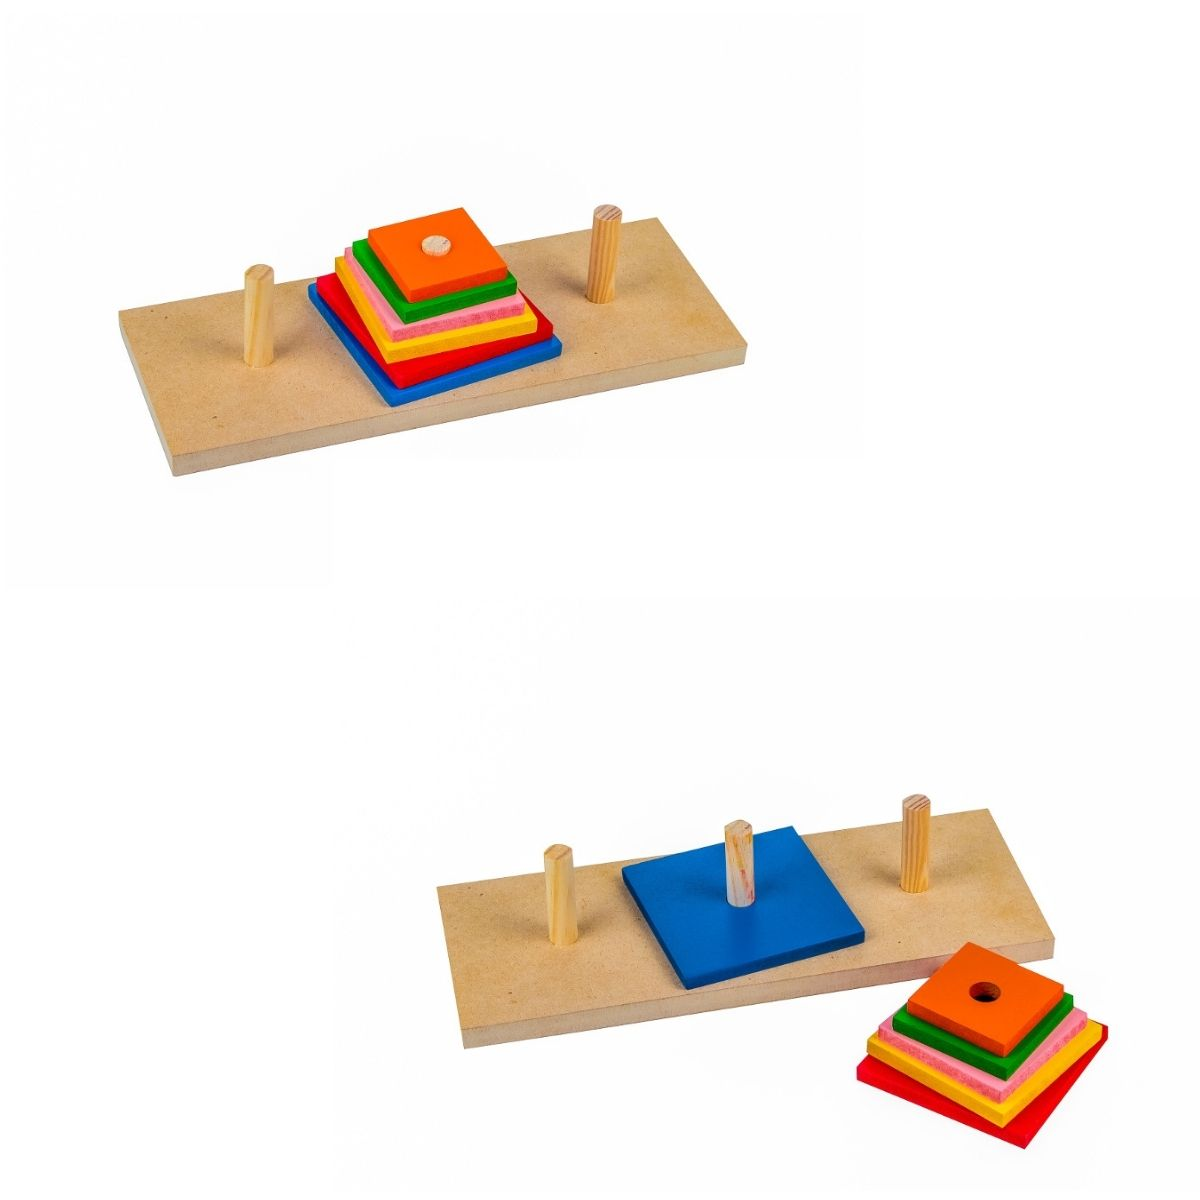 Brinquedo Torre De Hanói  Jogo Educativo Pedagógico